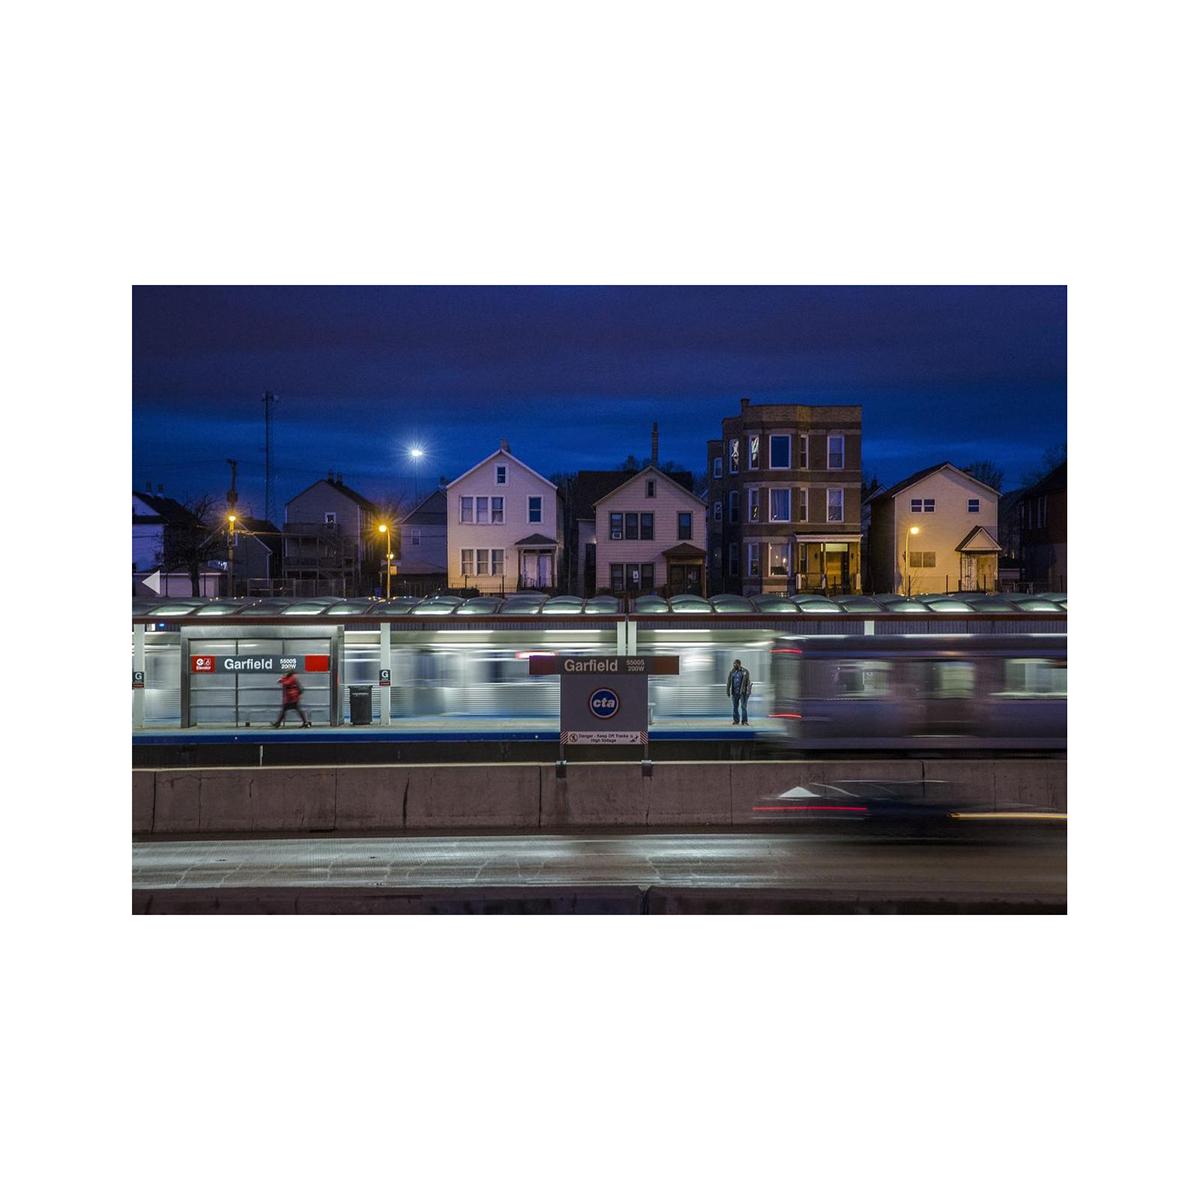 CTA Red Line, Garfield Stop Photograph